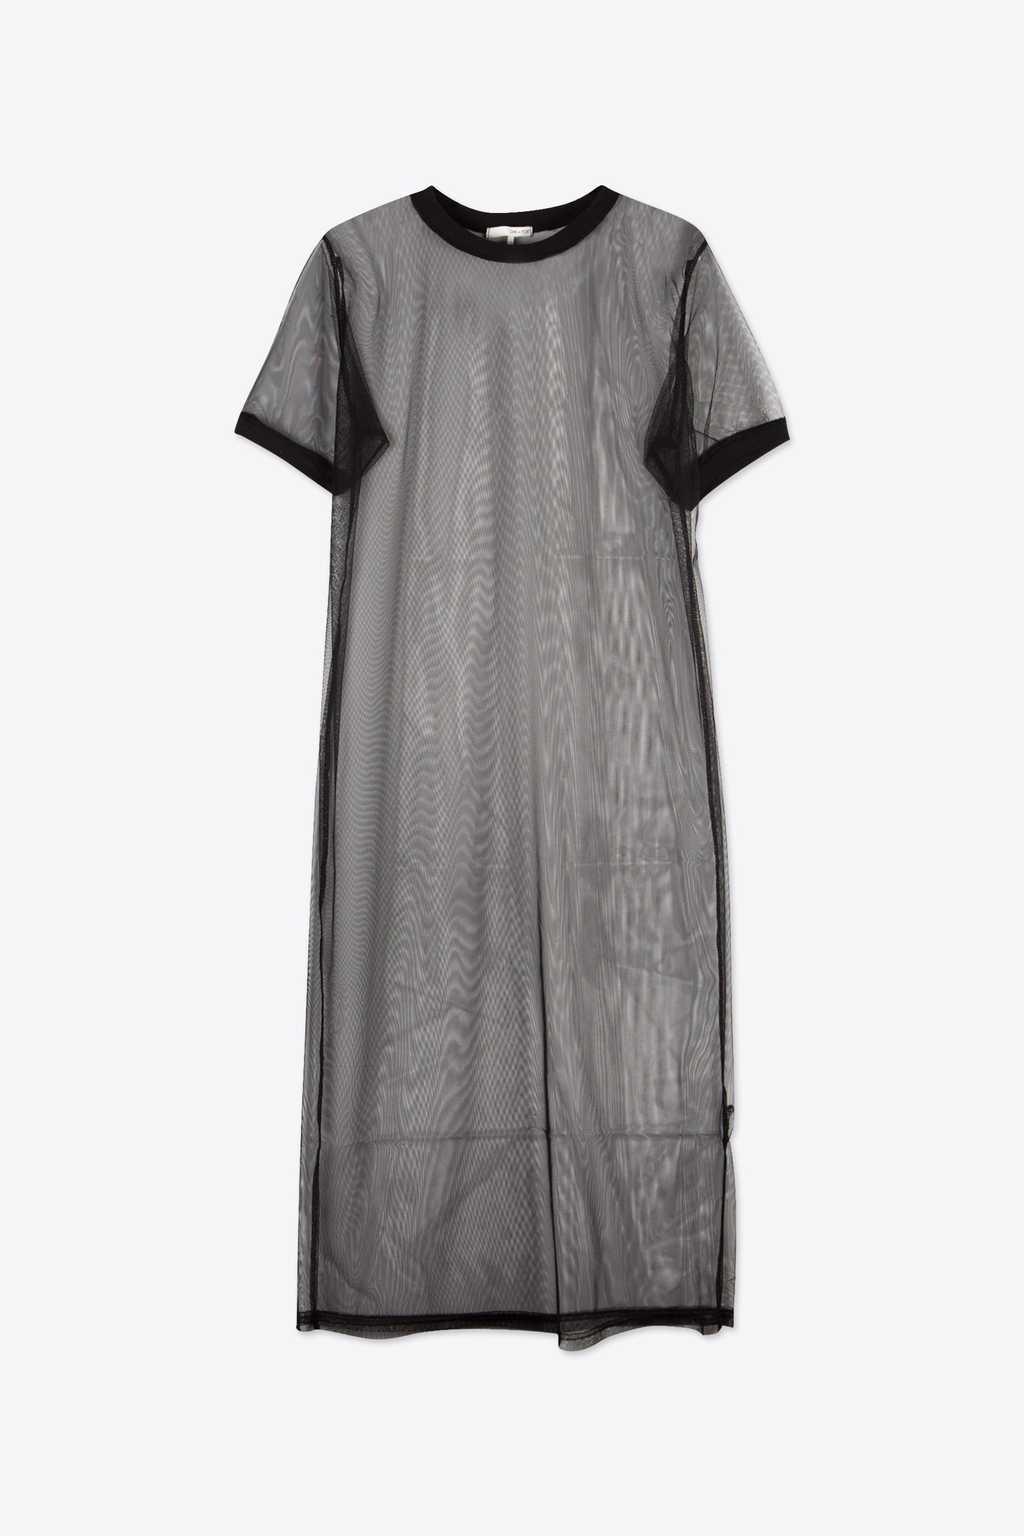 Mesh Dress H225 Black 5